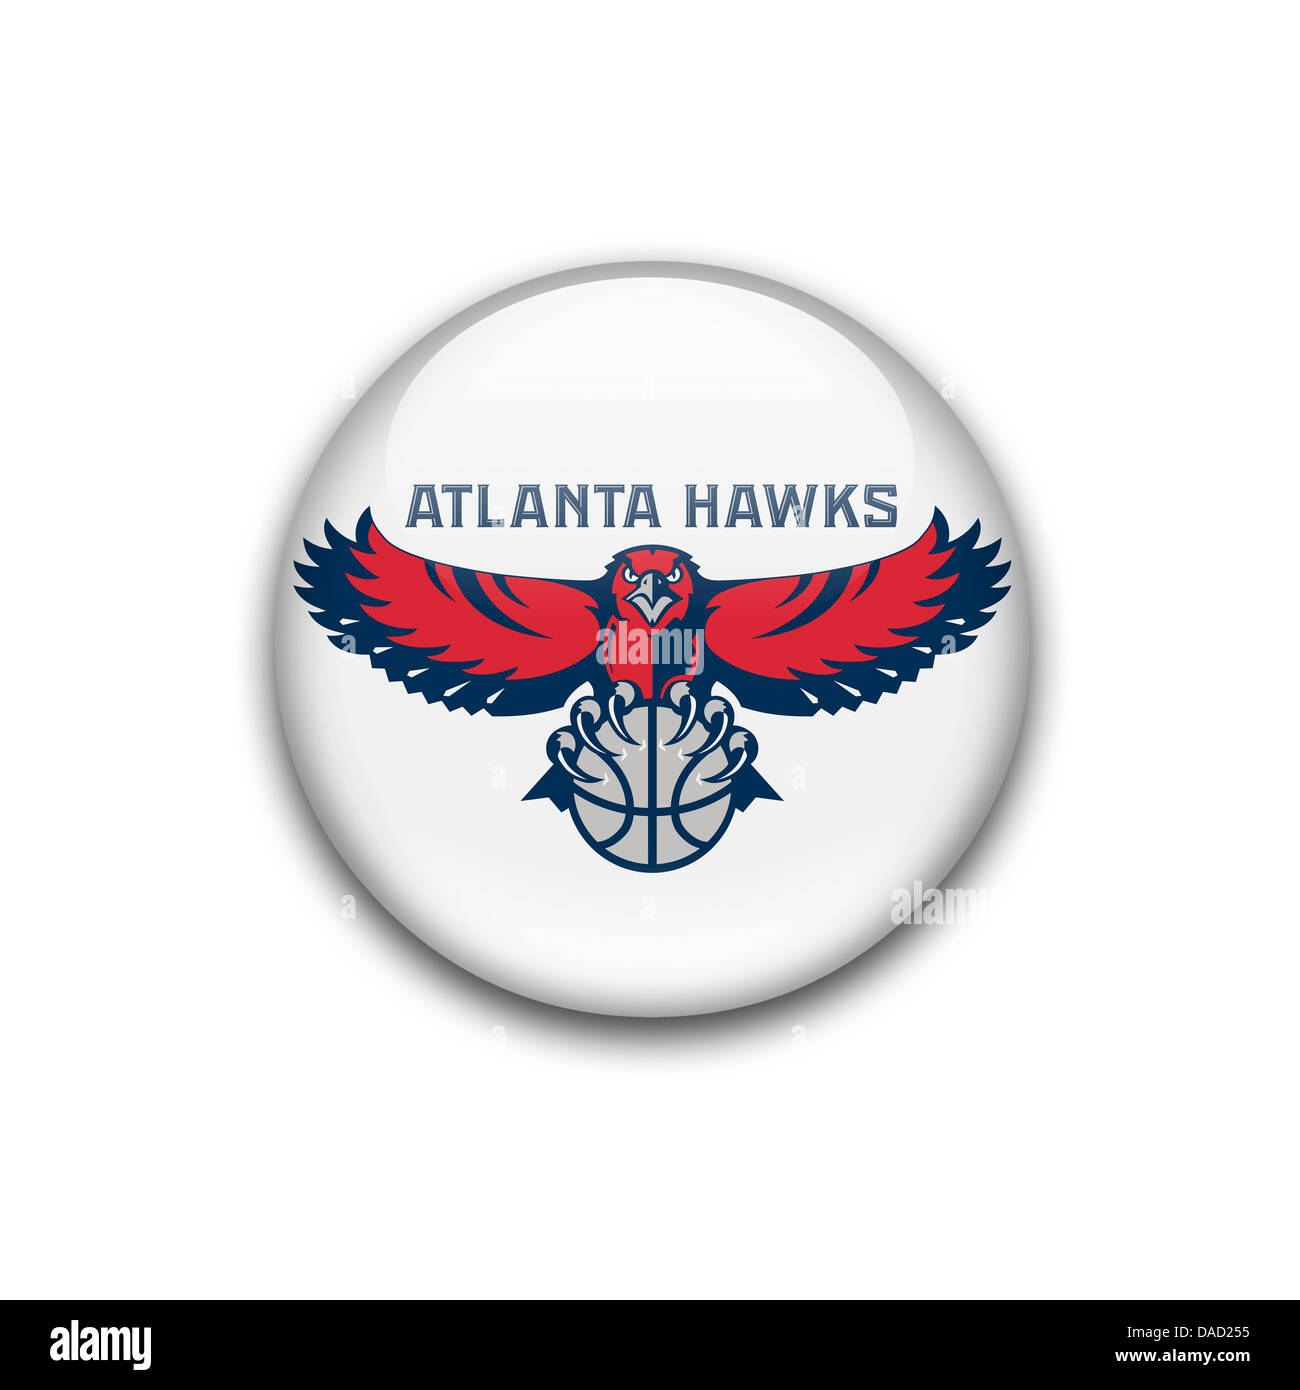 Atlanta hawks logo symbol icon flag emblem stock photo royalty atlanta hawks logo symbol icon flag emblem buycottarizona